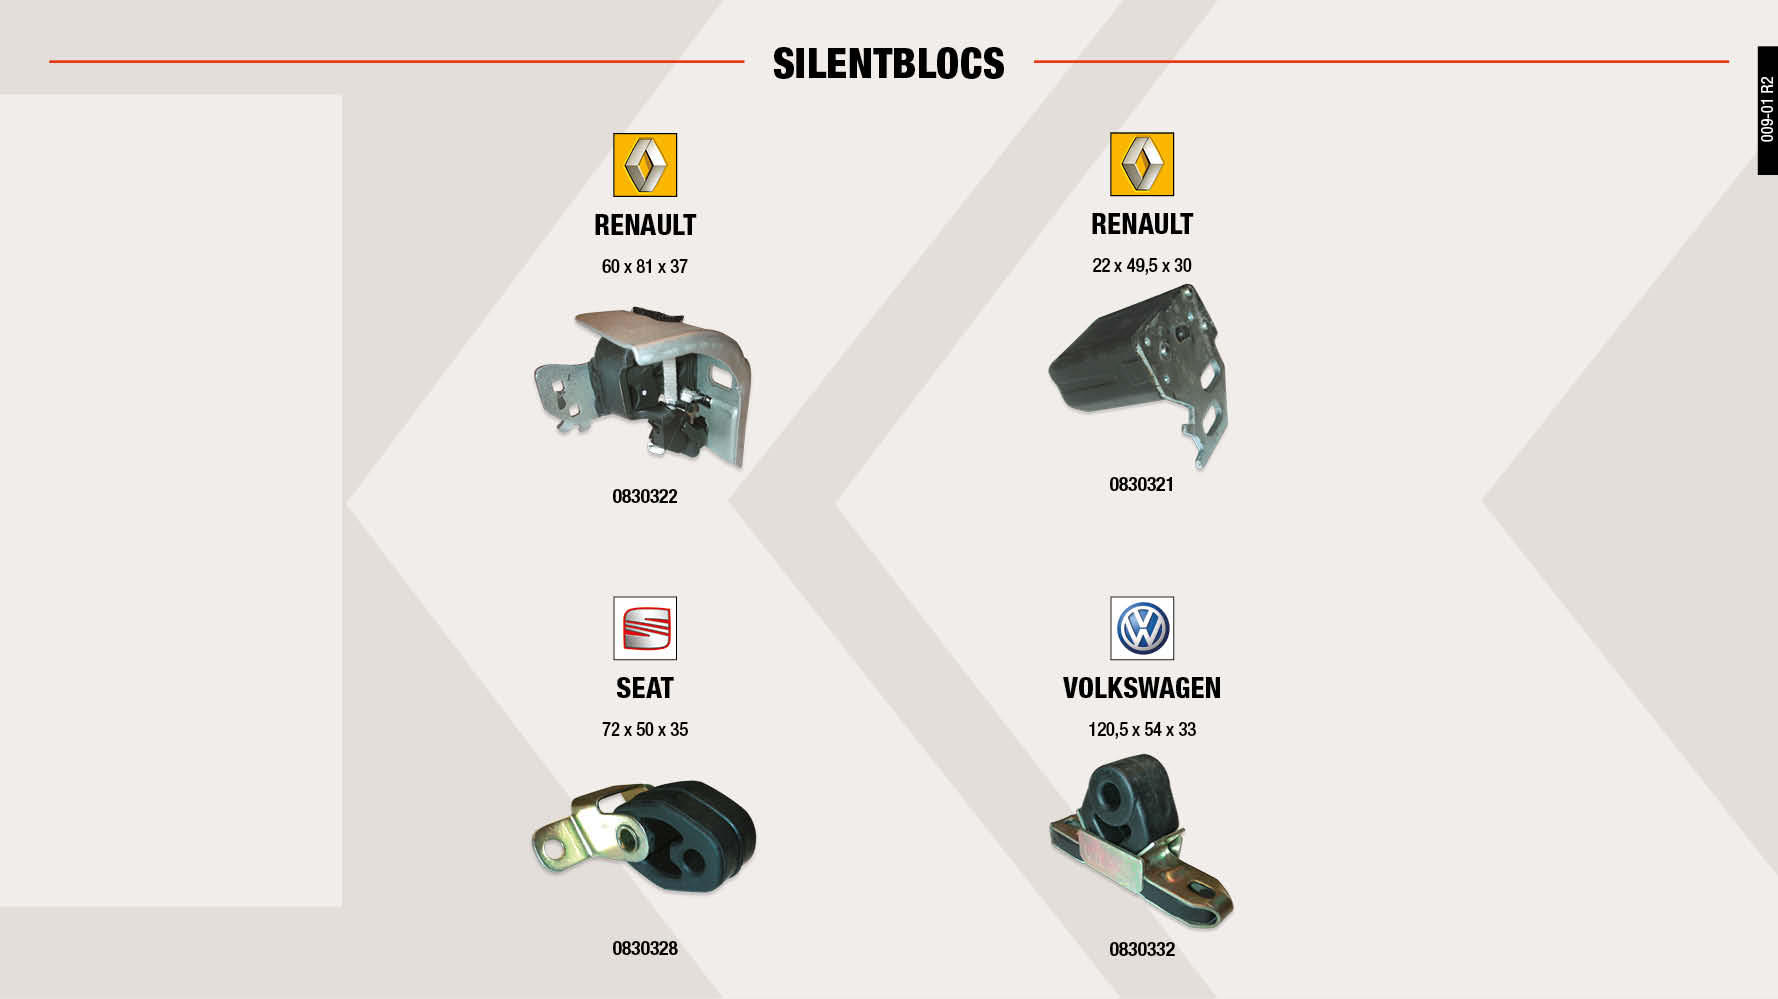 SILENBLOC RENAULT 22X49,5X30MM                              ,  SILENBLOC RENAULT 60X81X37MM                                ,  SILENBLOC VW 120,5X54X33MM                                  ,  SILENBLOC SEAT 72X50X35MM                                   ,